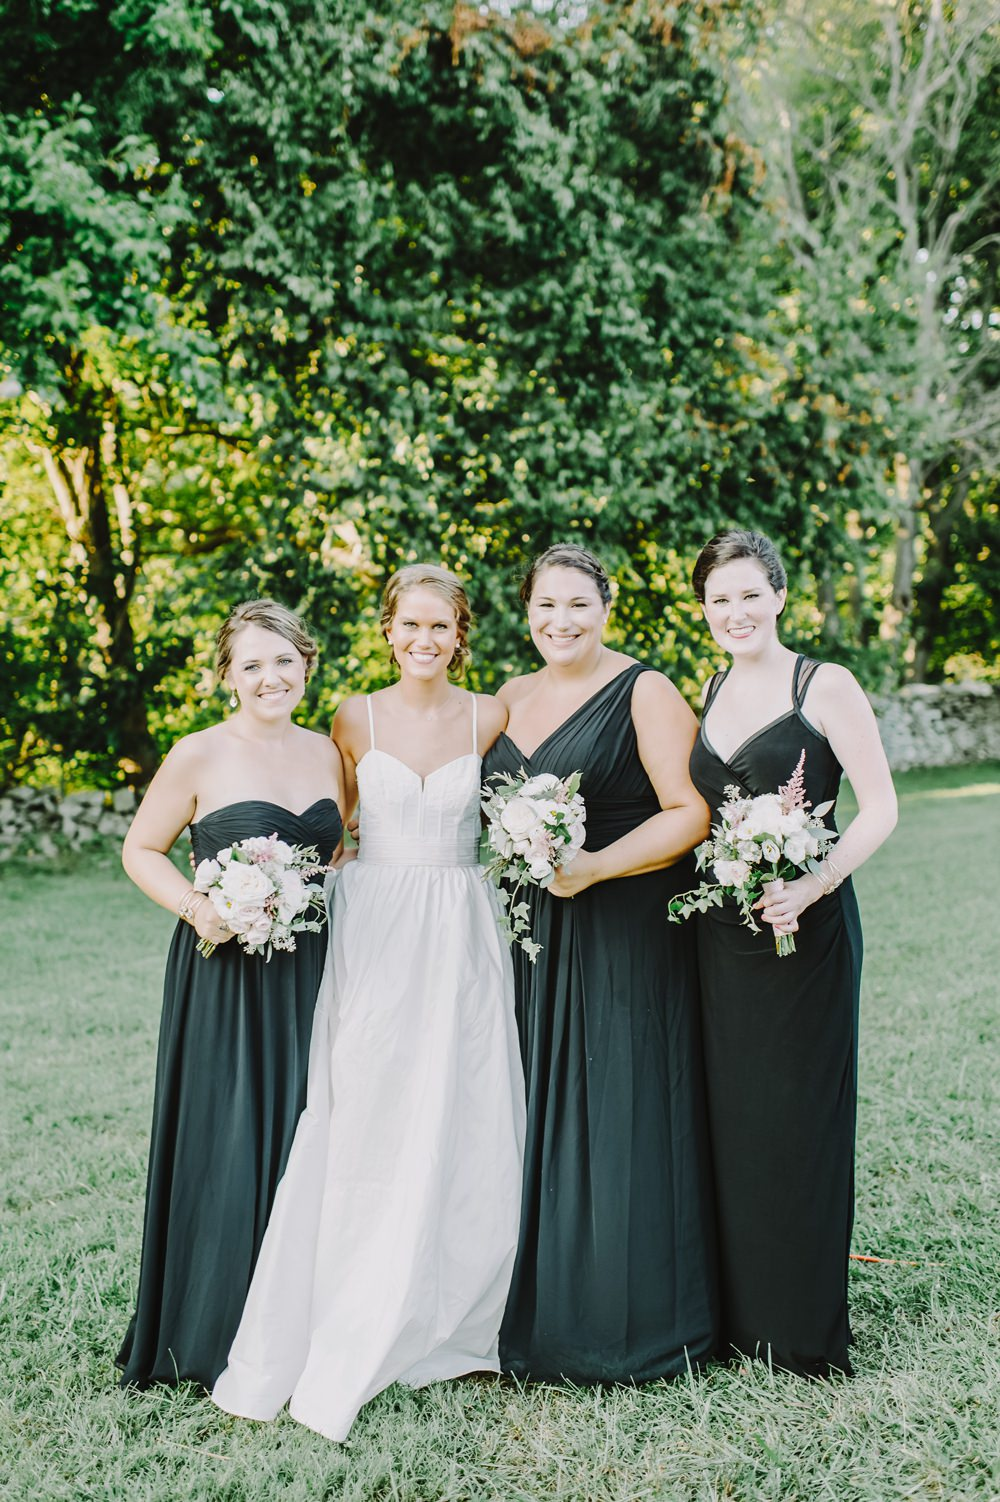 Long Black Bridesmaid Dress Dresses Bridesmaids Maryland Wedding L. Hewitt Photography